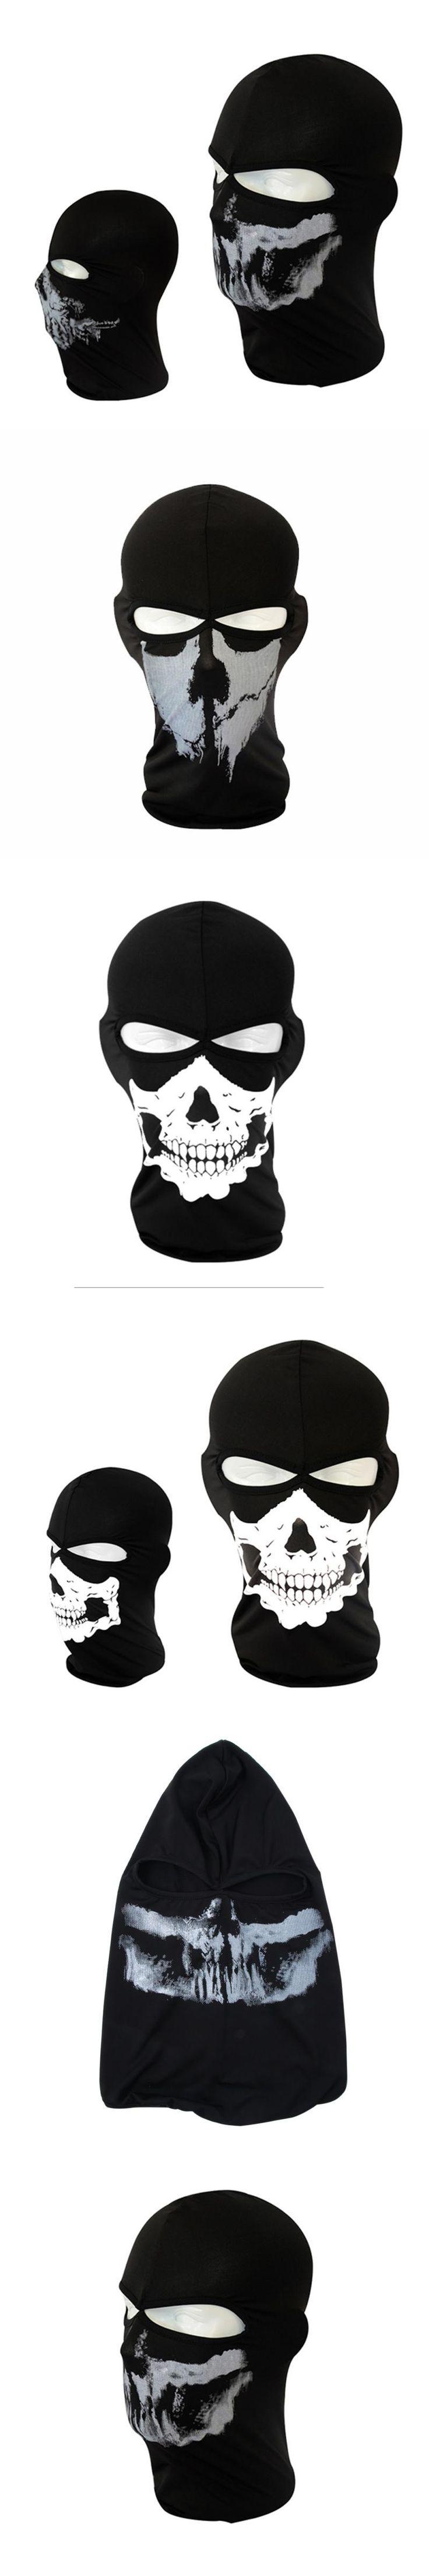 Fashion Balaclava Summer Sun Ultra UV Protection Printed Full Face Mask hat